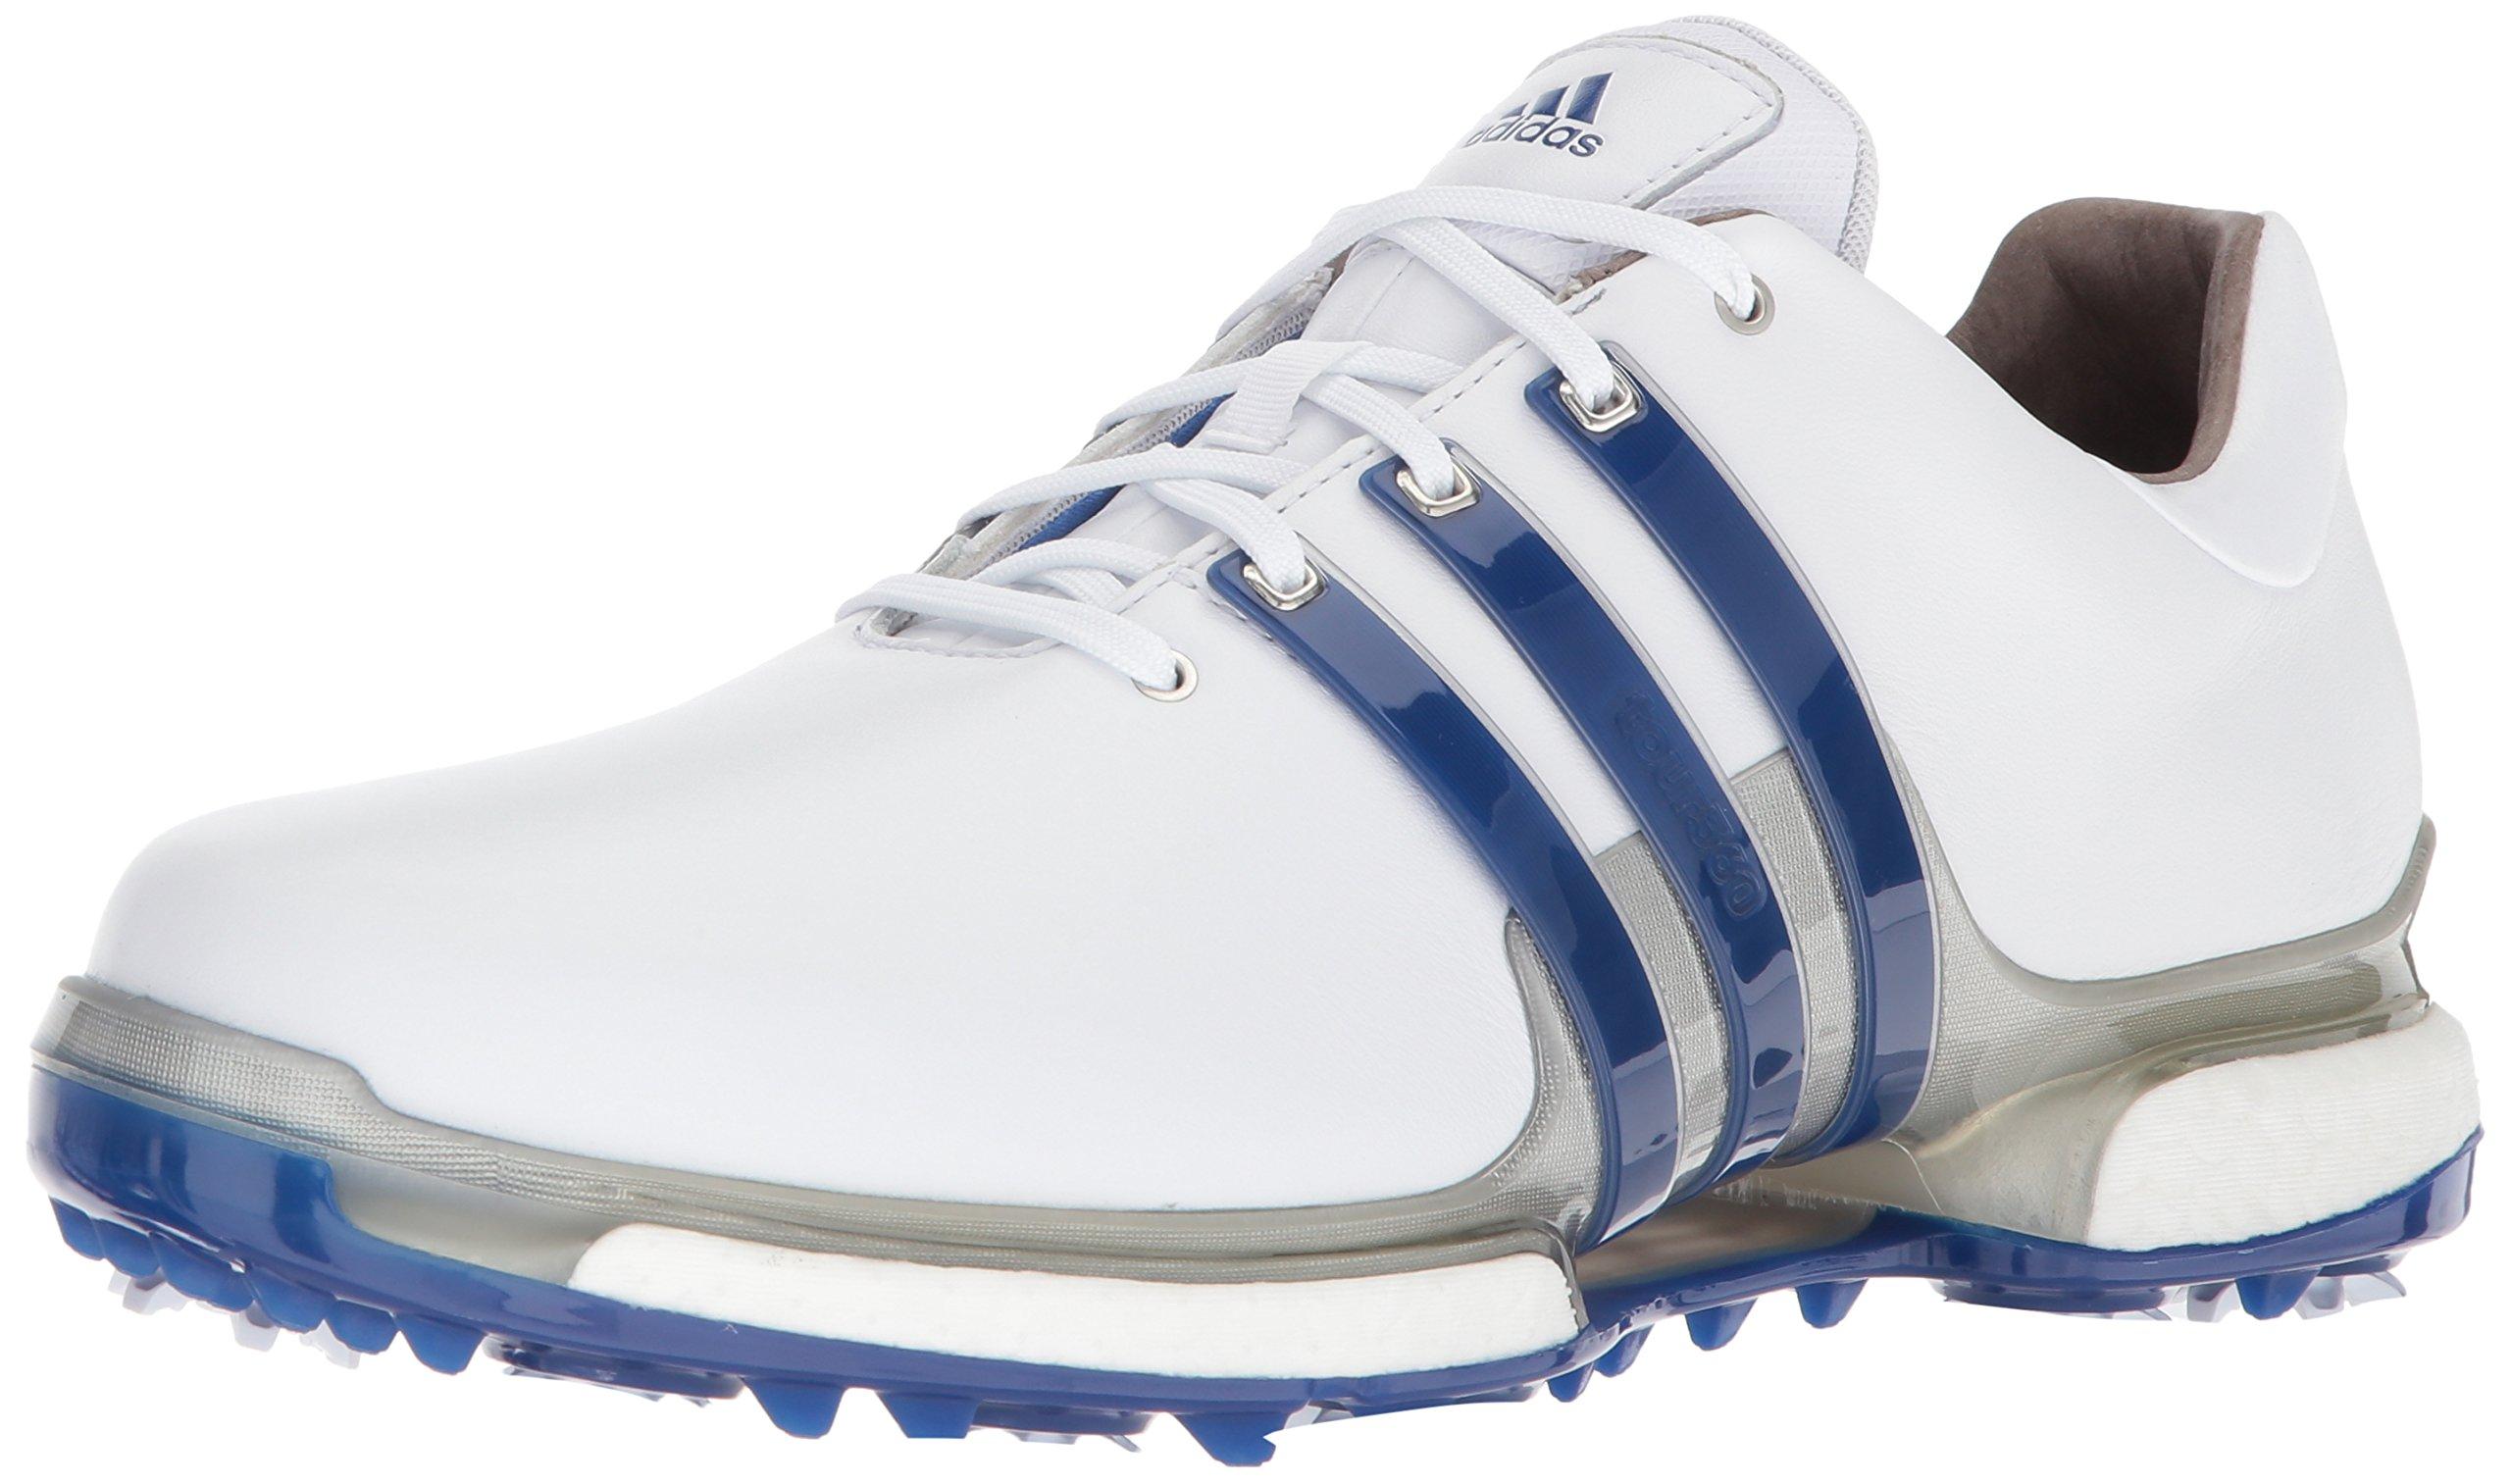 adidas Men's TOUR 360 2.0 Golf Shoe, White/Royal/Silver Metallic, 7 M US